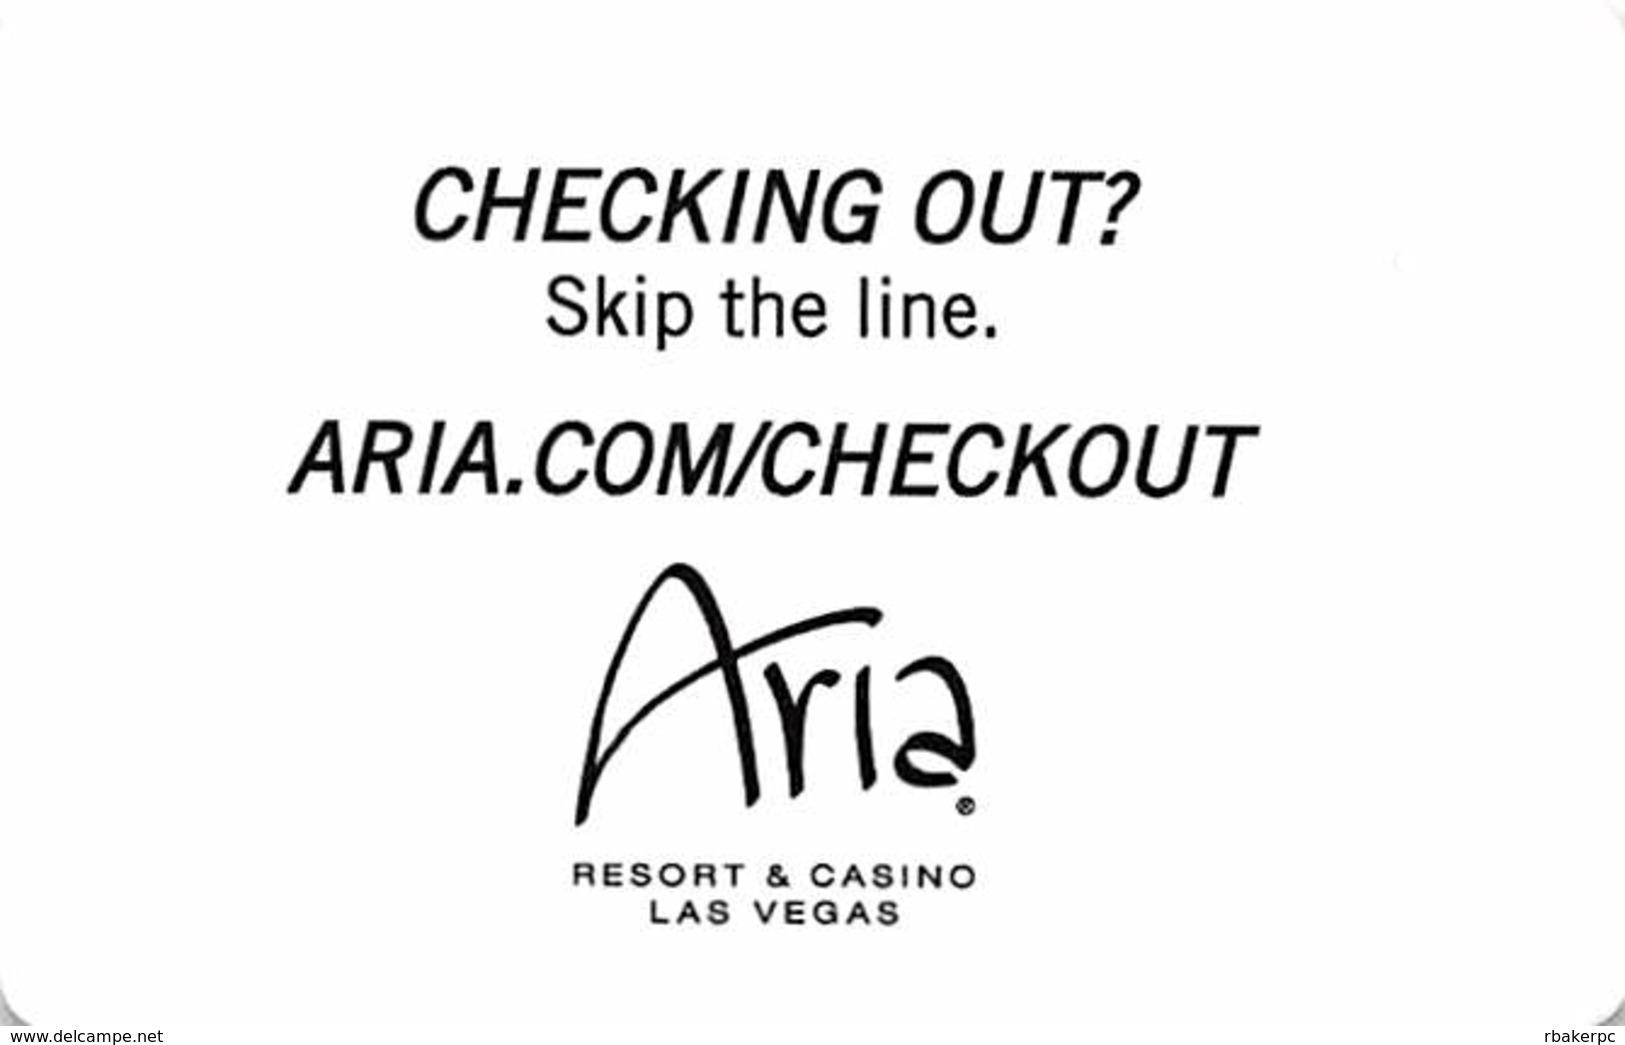 Aria Casino - Las Vegas, NV - RFID Hotel Room Key Card - Hotel Keycards